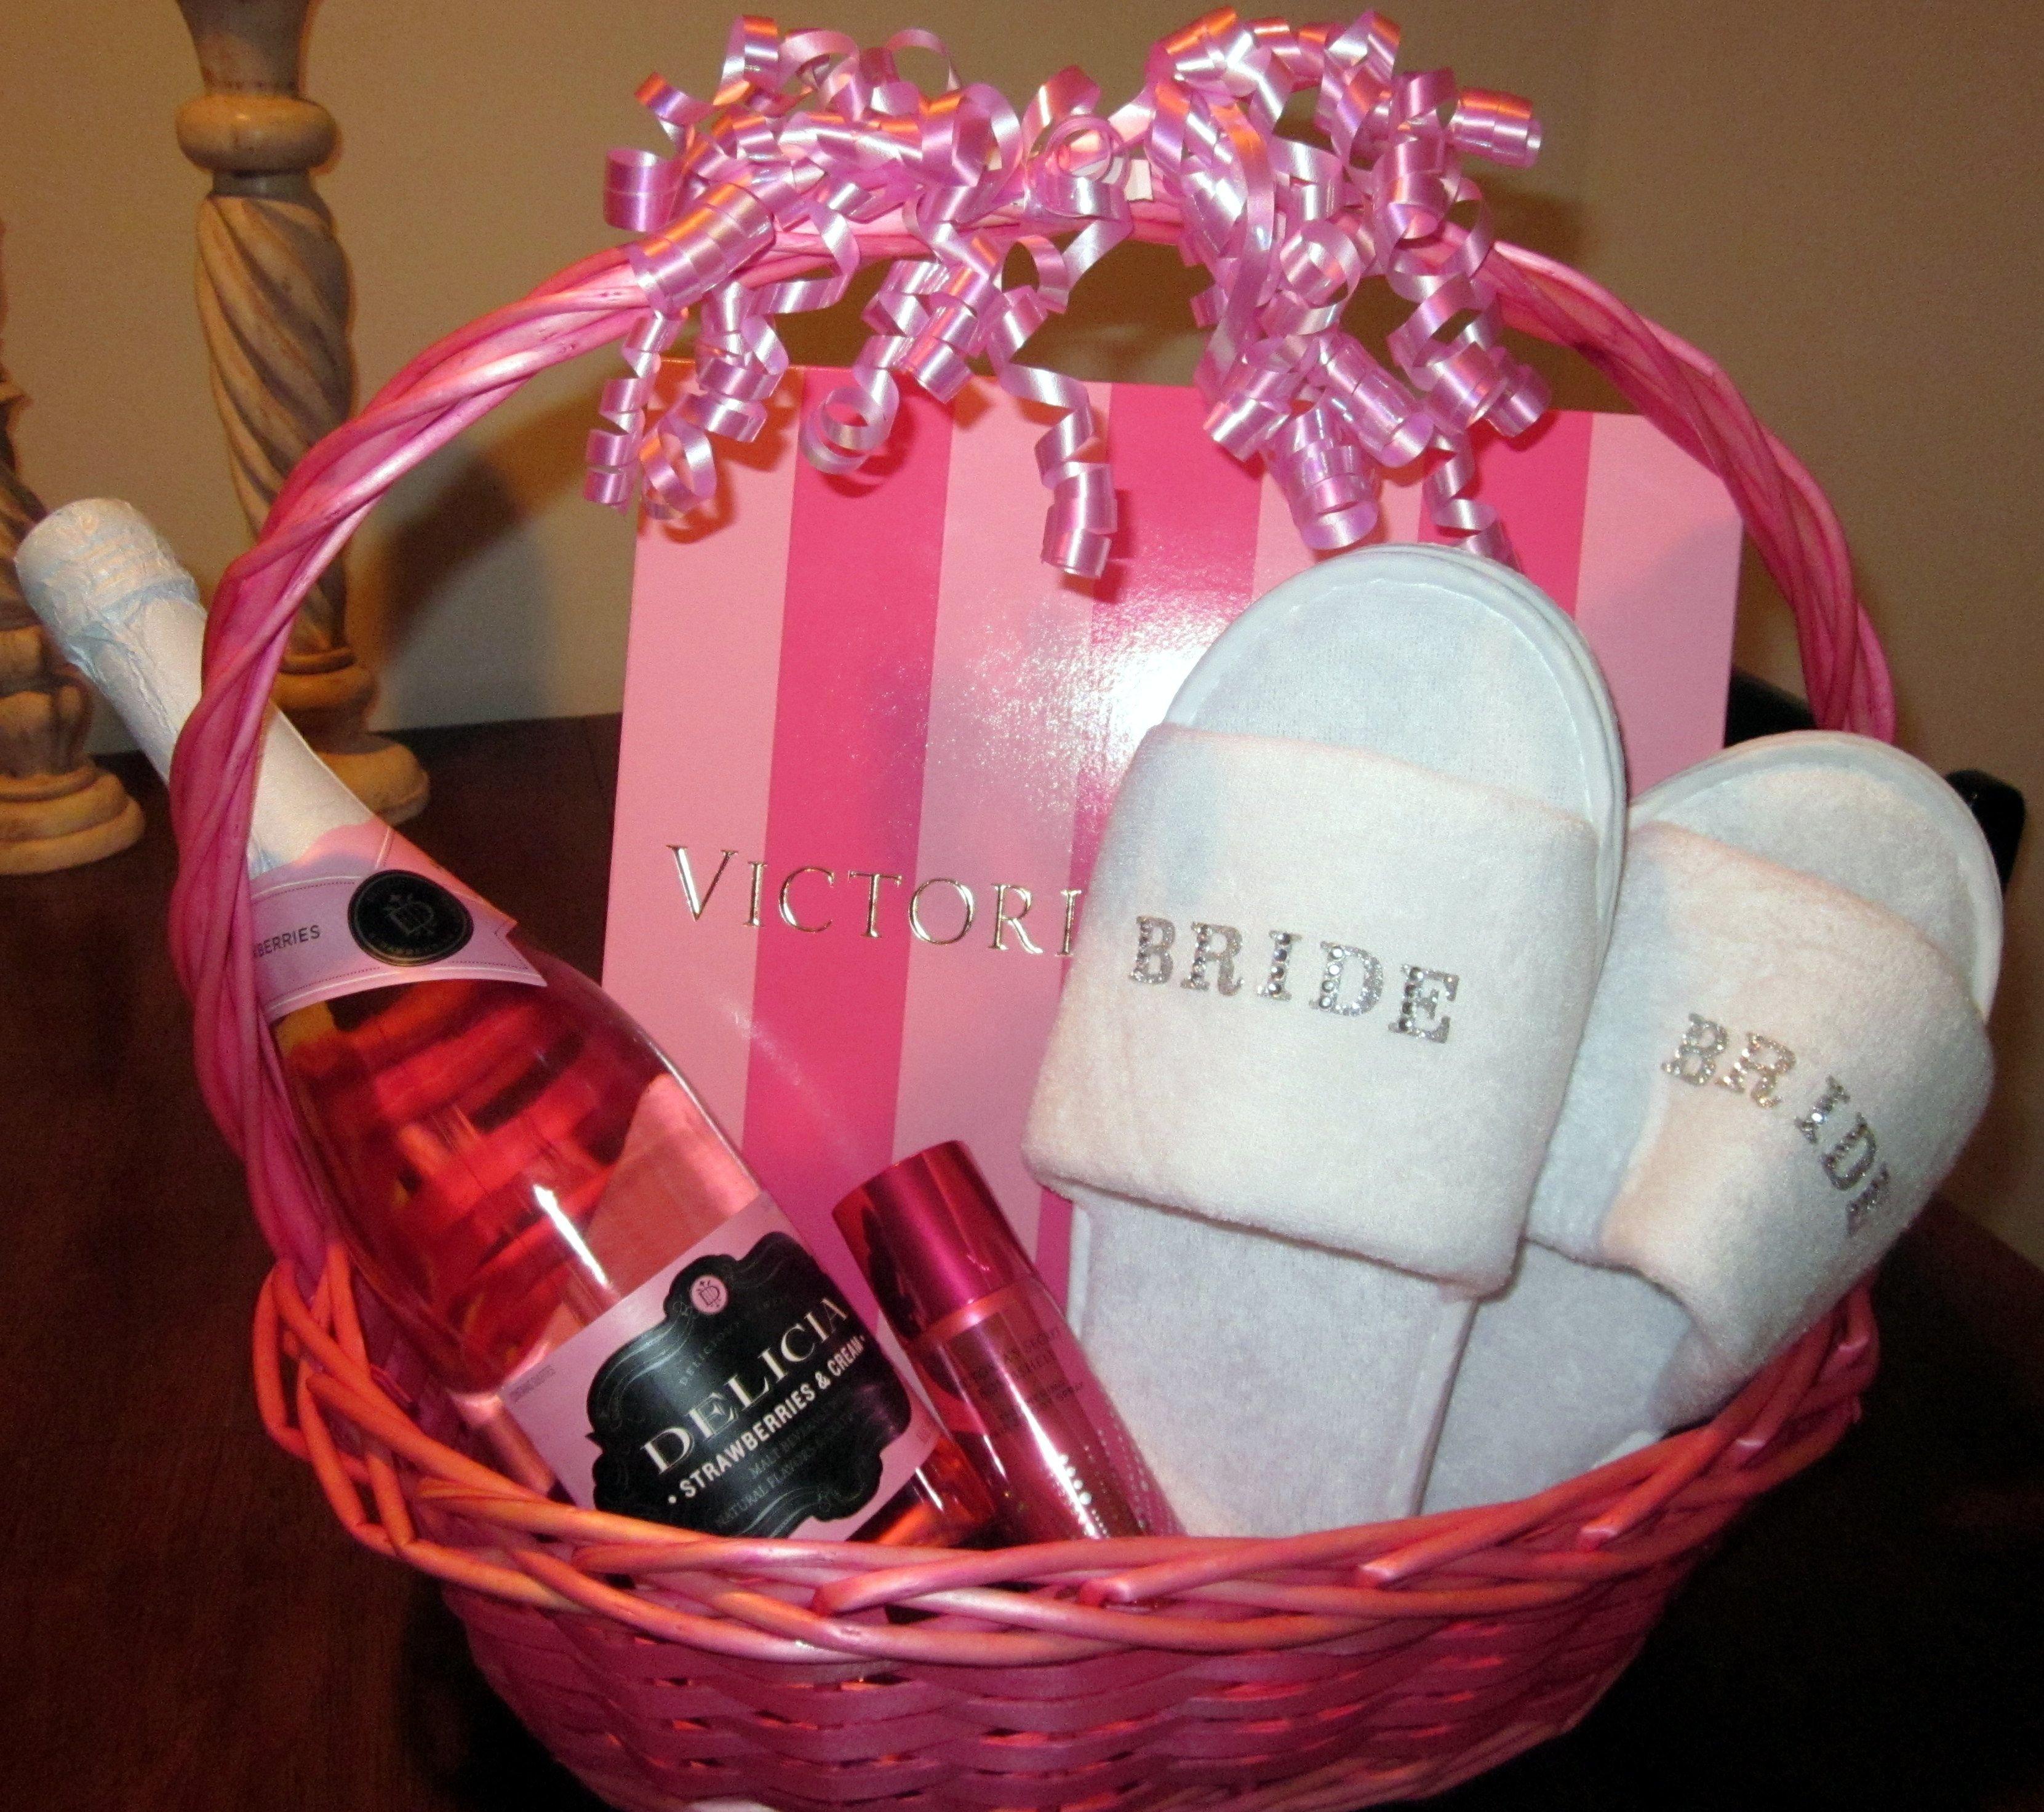 10 Most Popular Homemade Bridal Shower Gift Ideas bridal shower gift ideas shell adore spa slippers wedding 12 2020